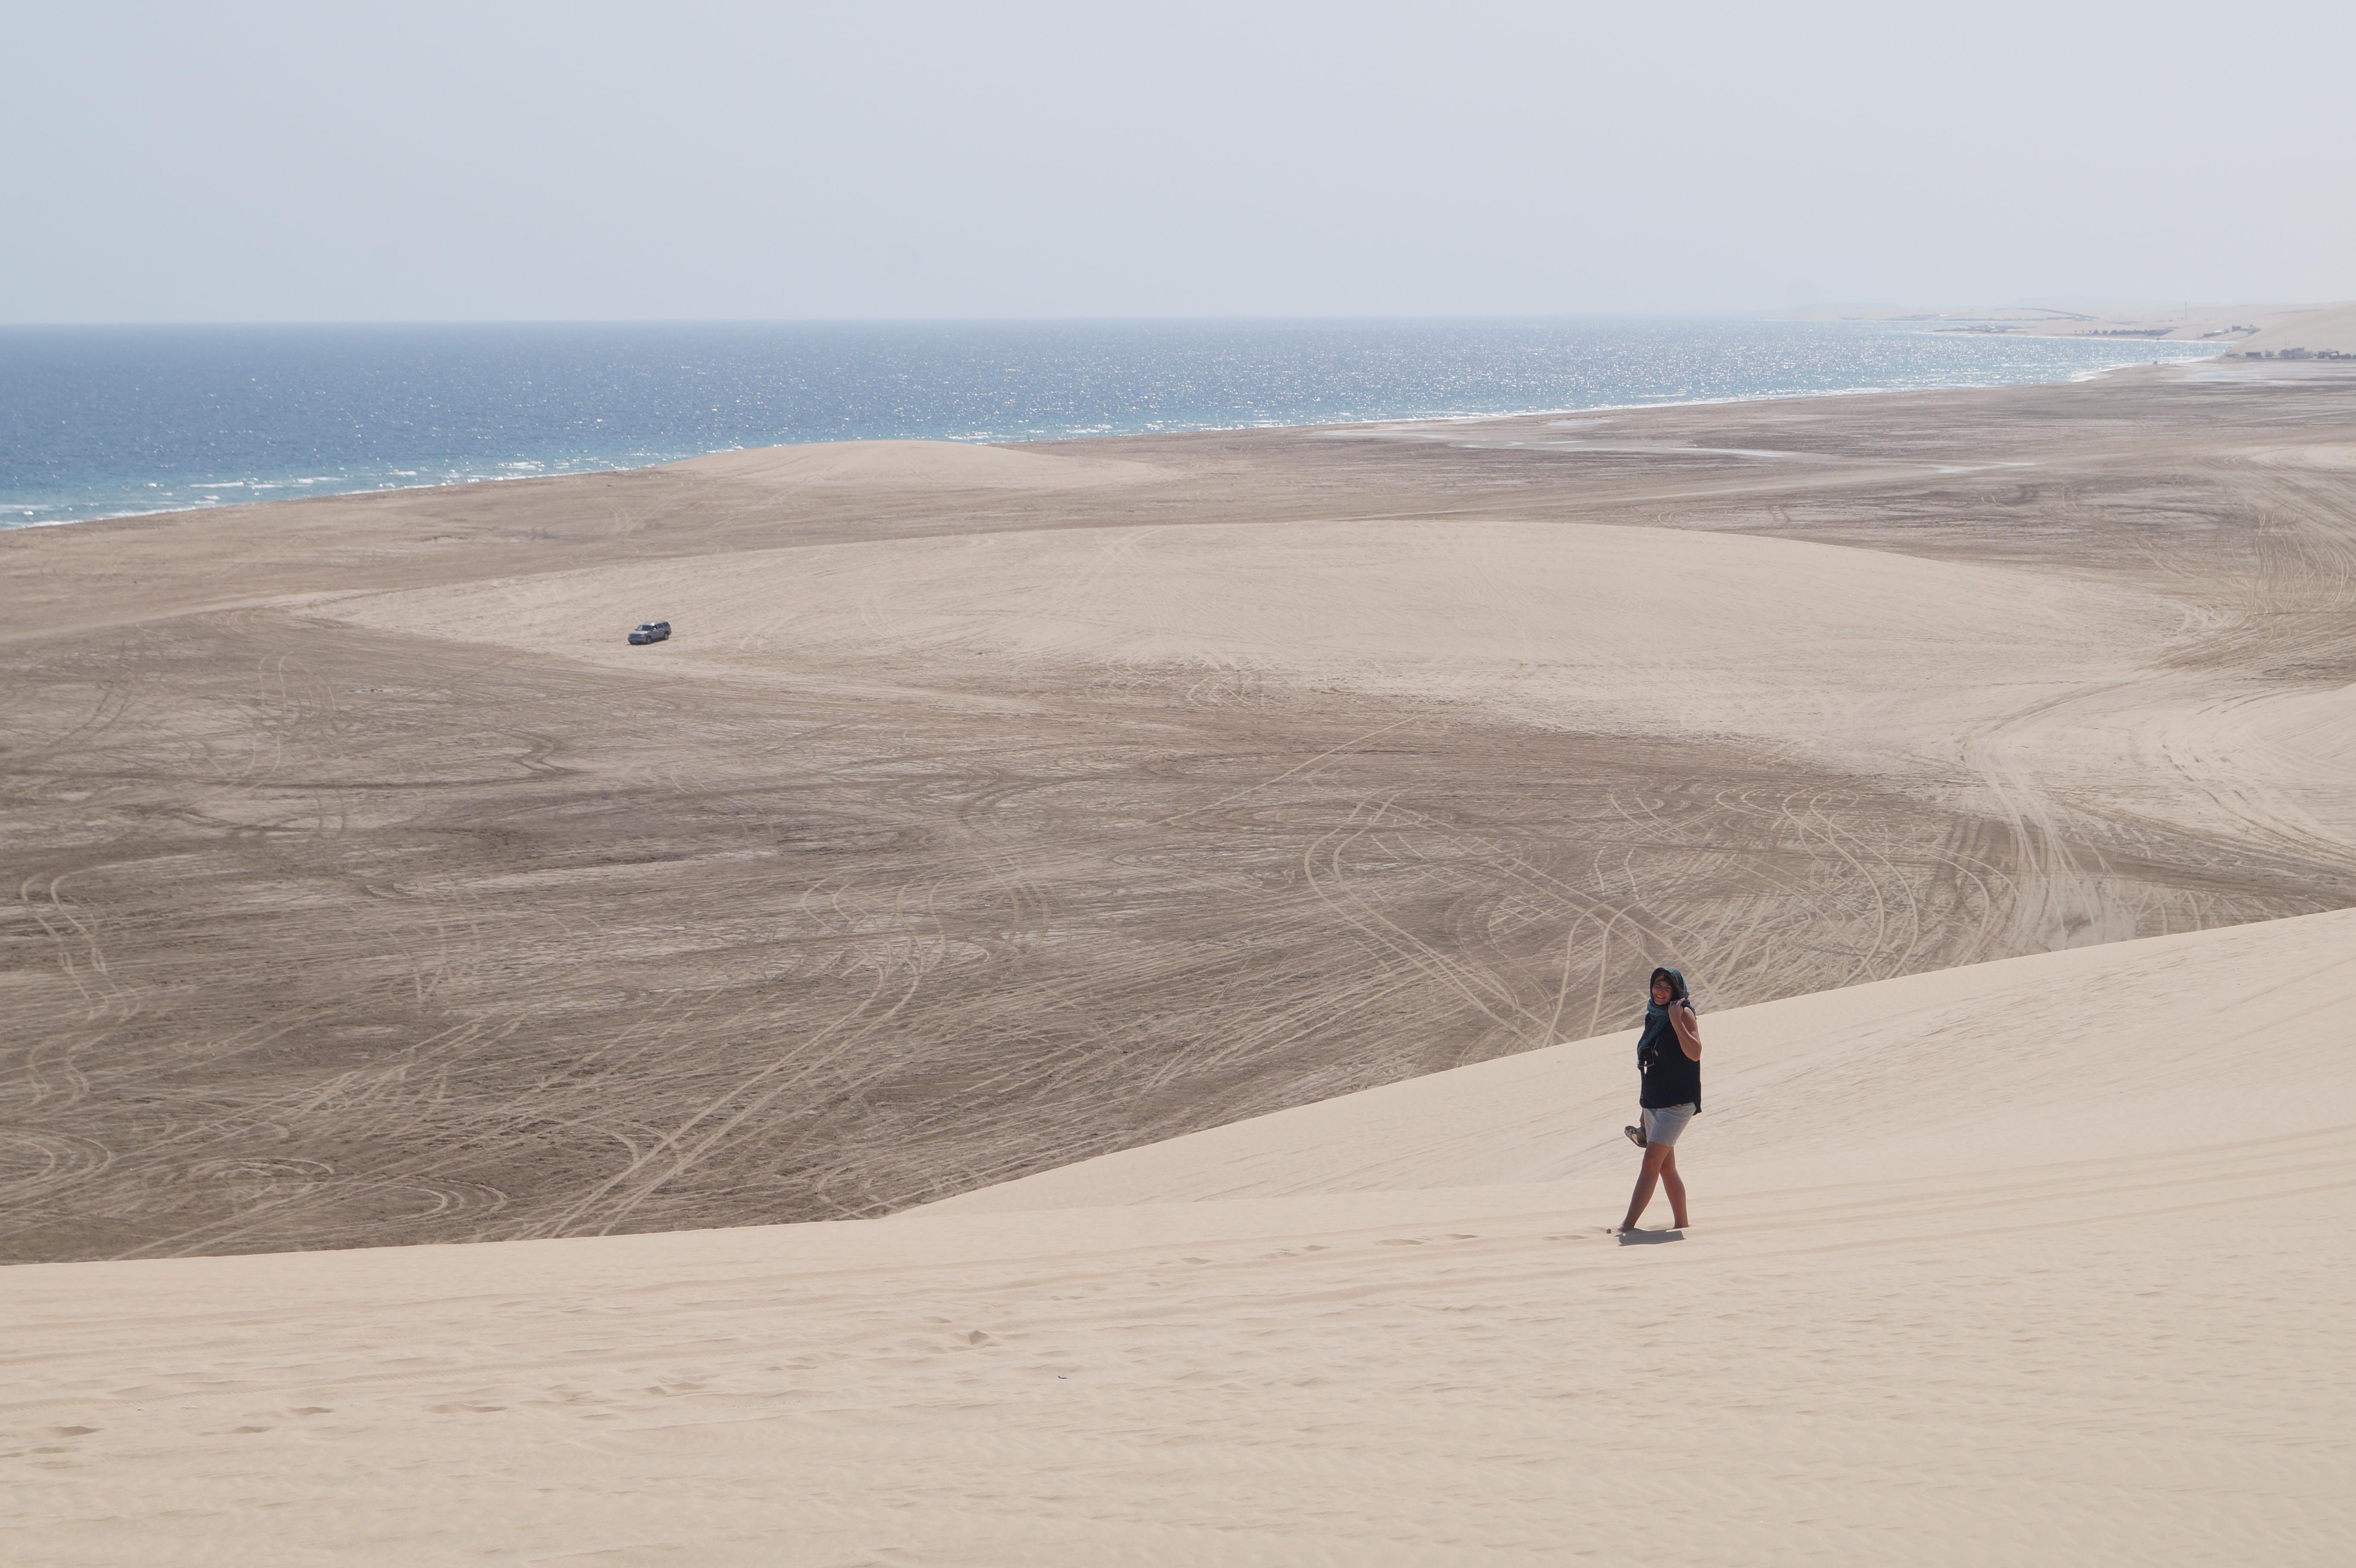 sand dunes Sealine Beach (Mesaieed)